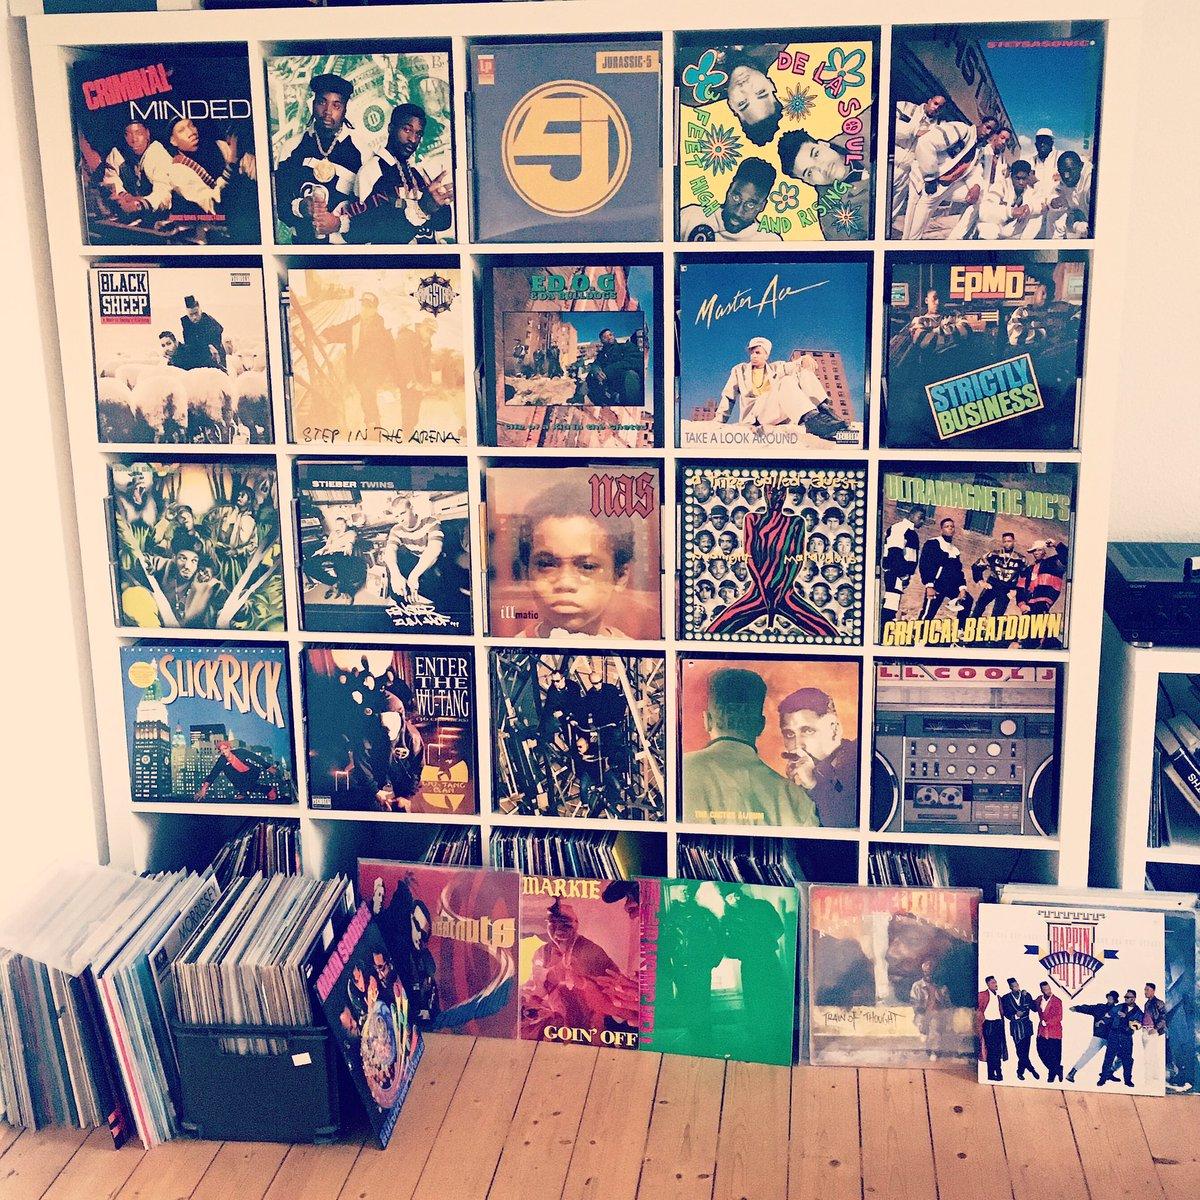 some of my favorite hip hop vinyl #rap #hiphop #vinylpic.twitter.com/fZLggm4Z9O